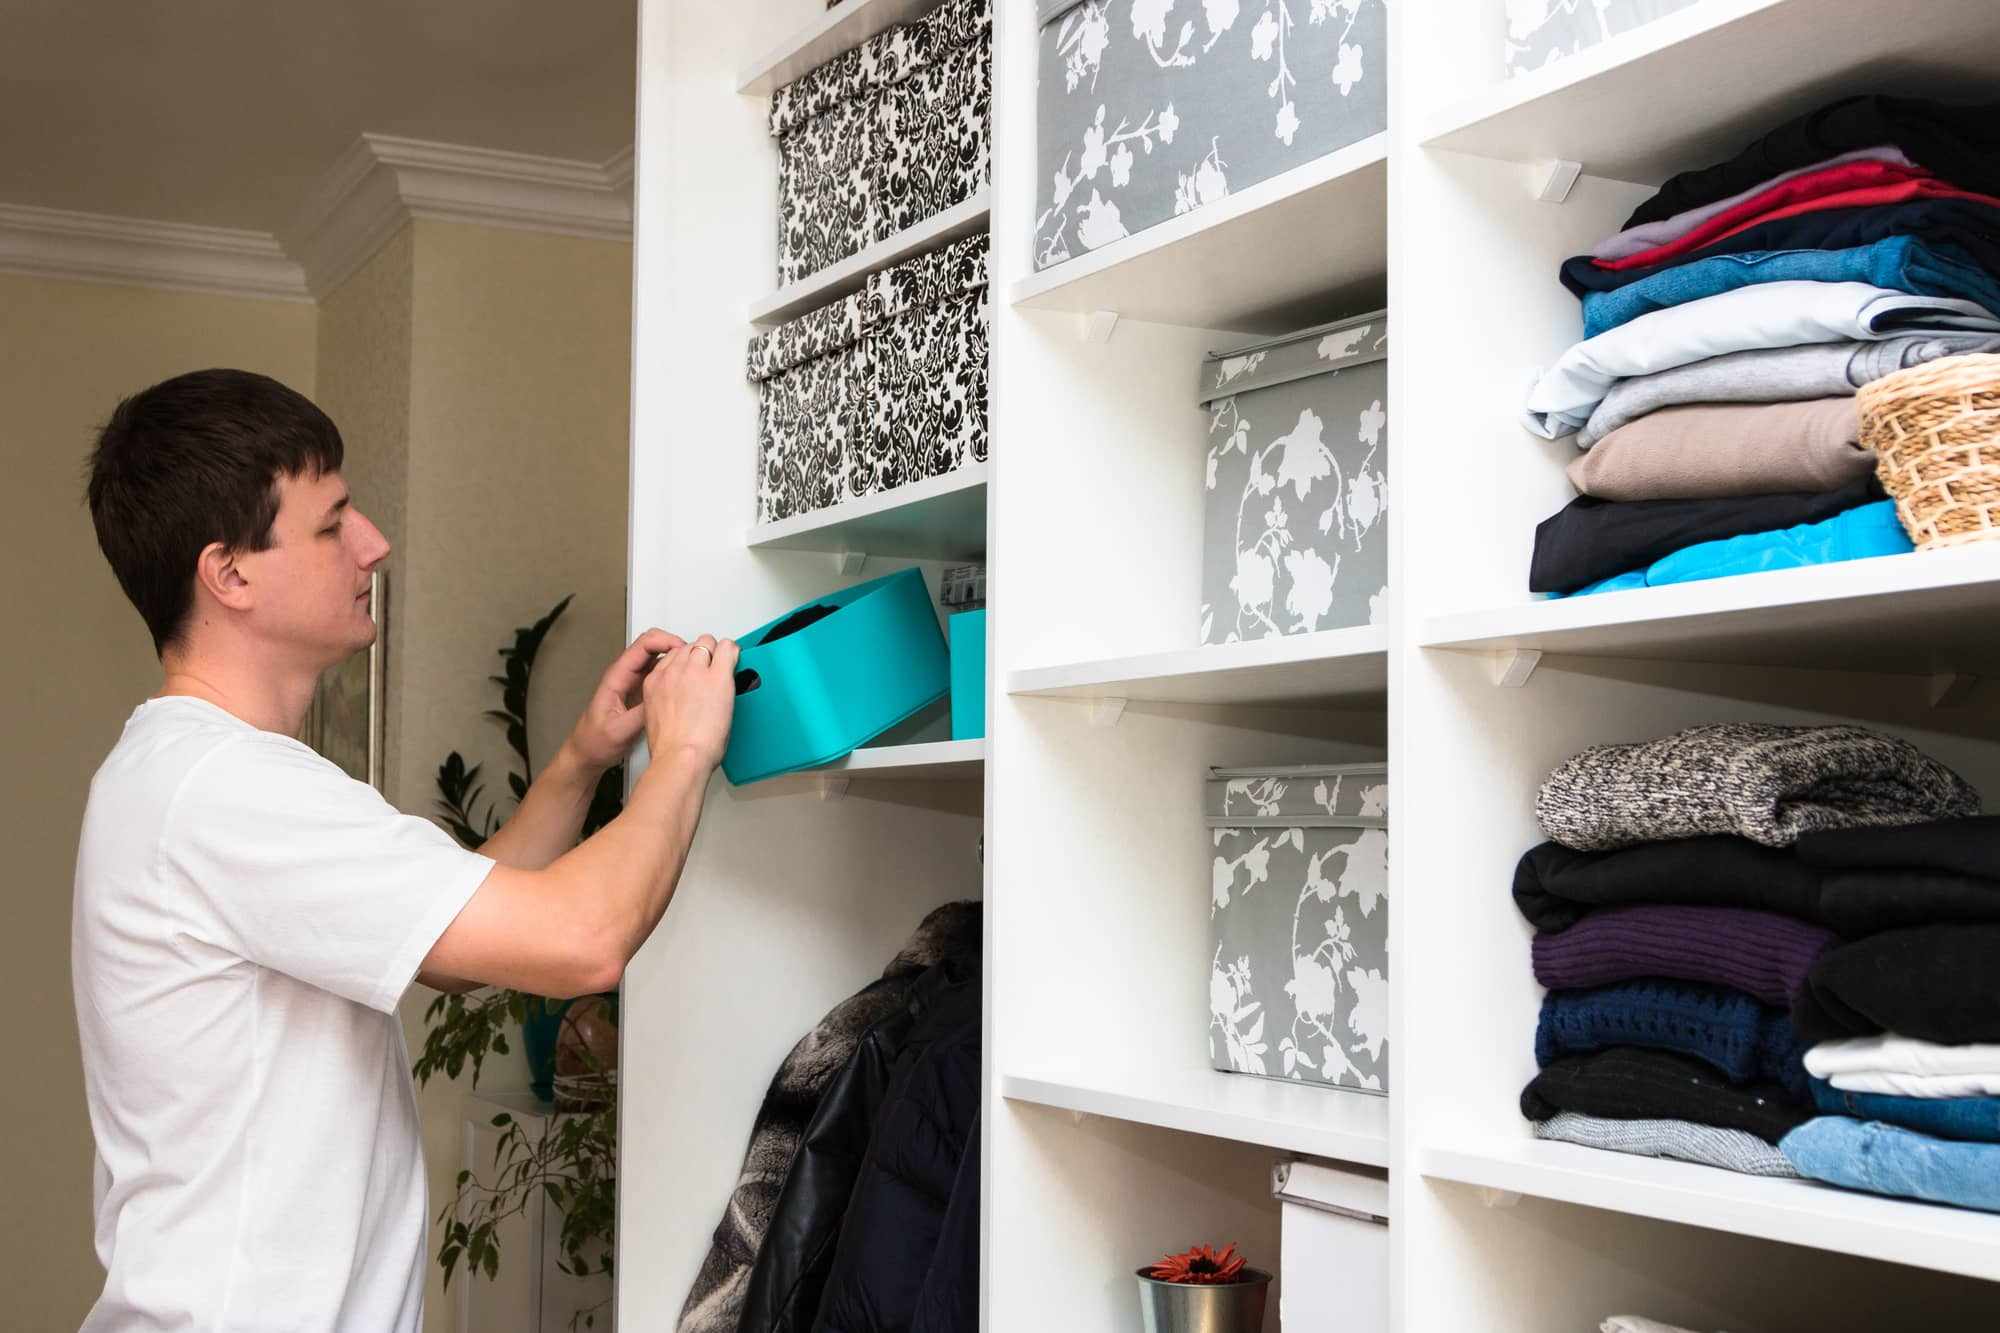 Make Room: 4 Easy Home Storage Ideas